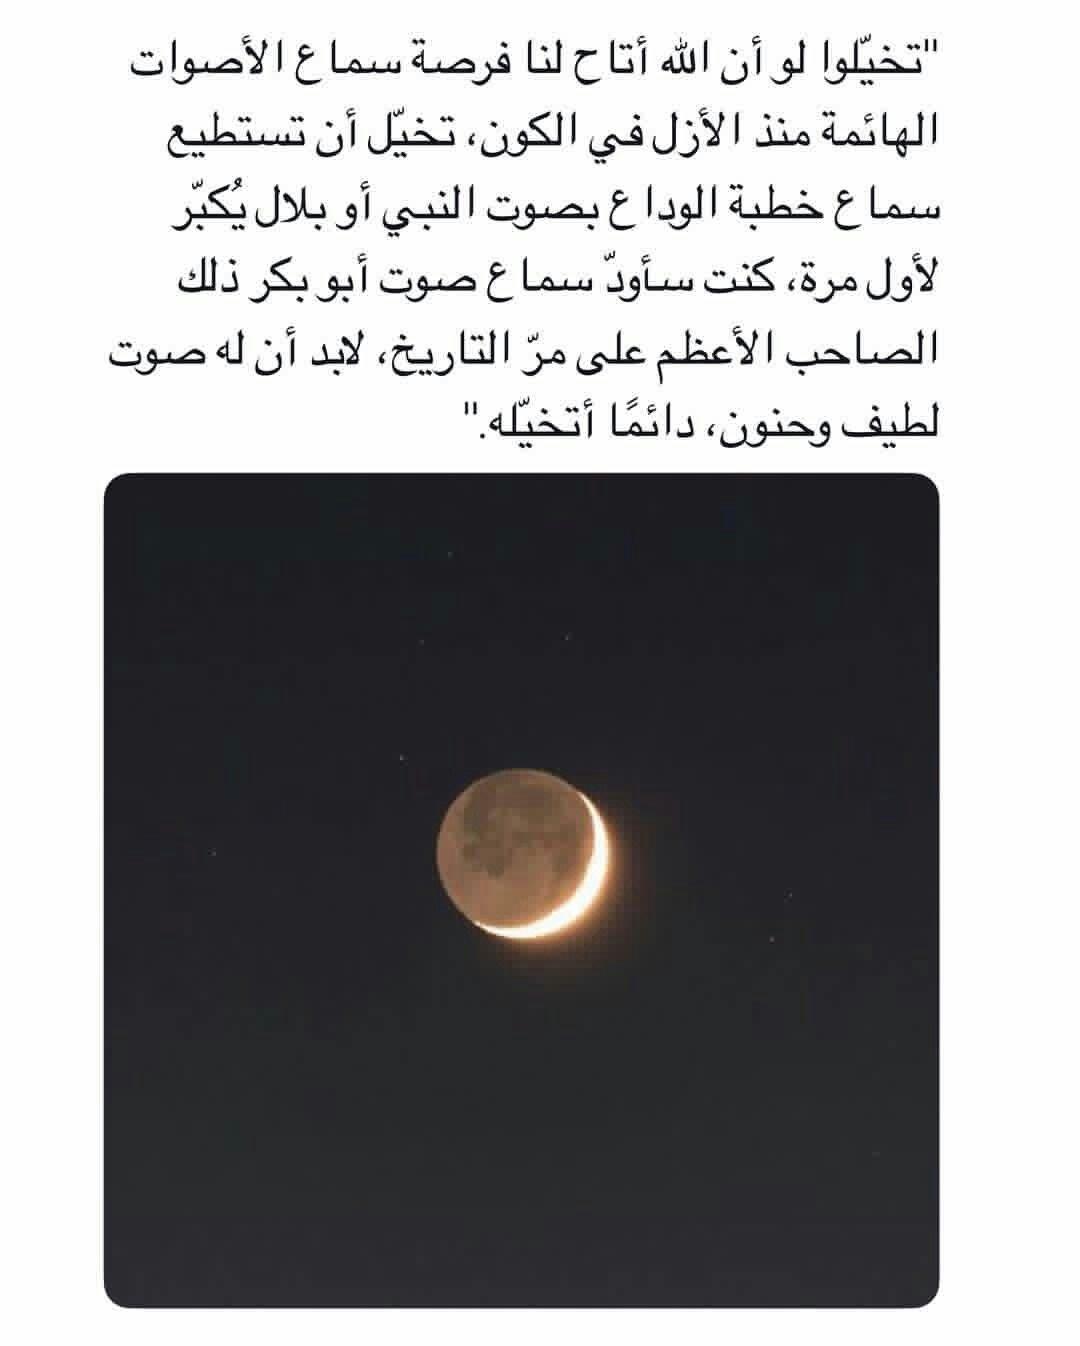 Pin By ظ ل On عب ـارات ج ميلة Arabic Celestial Bodies Body Celestial